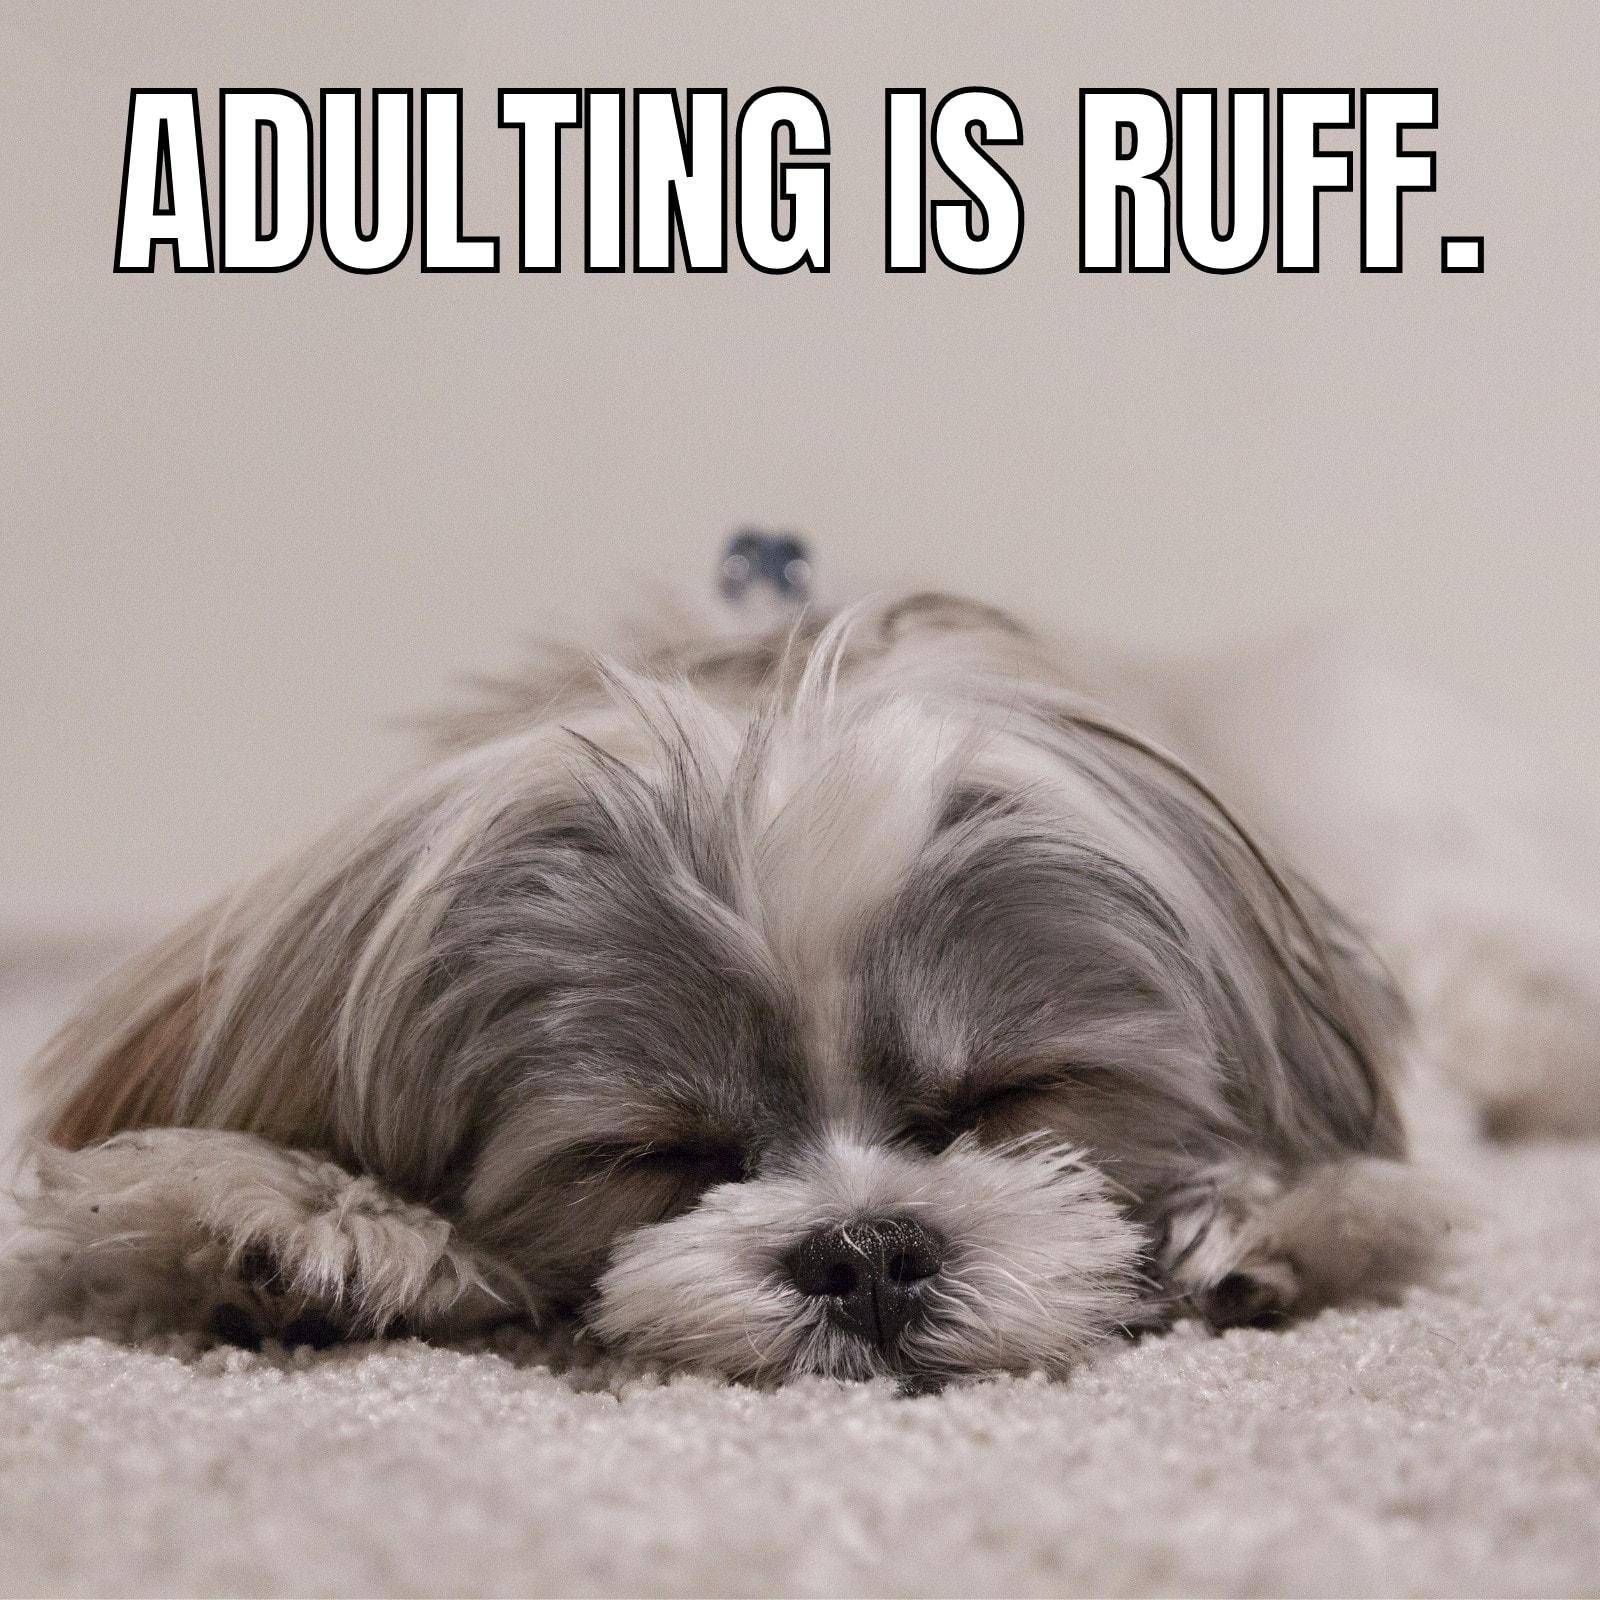 Dog Adulting Square Animal Meme